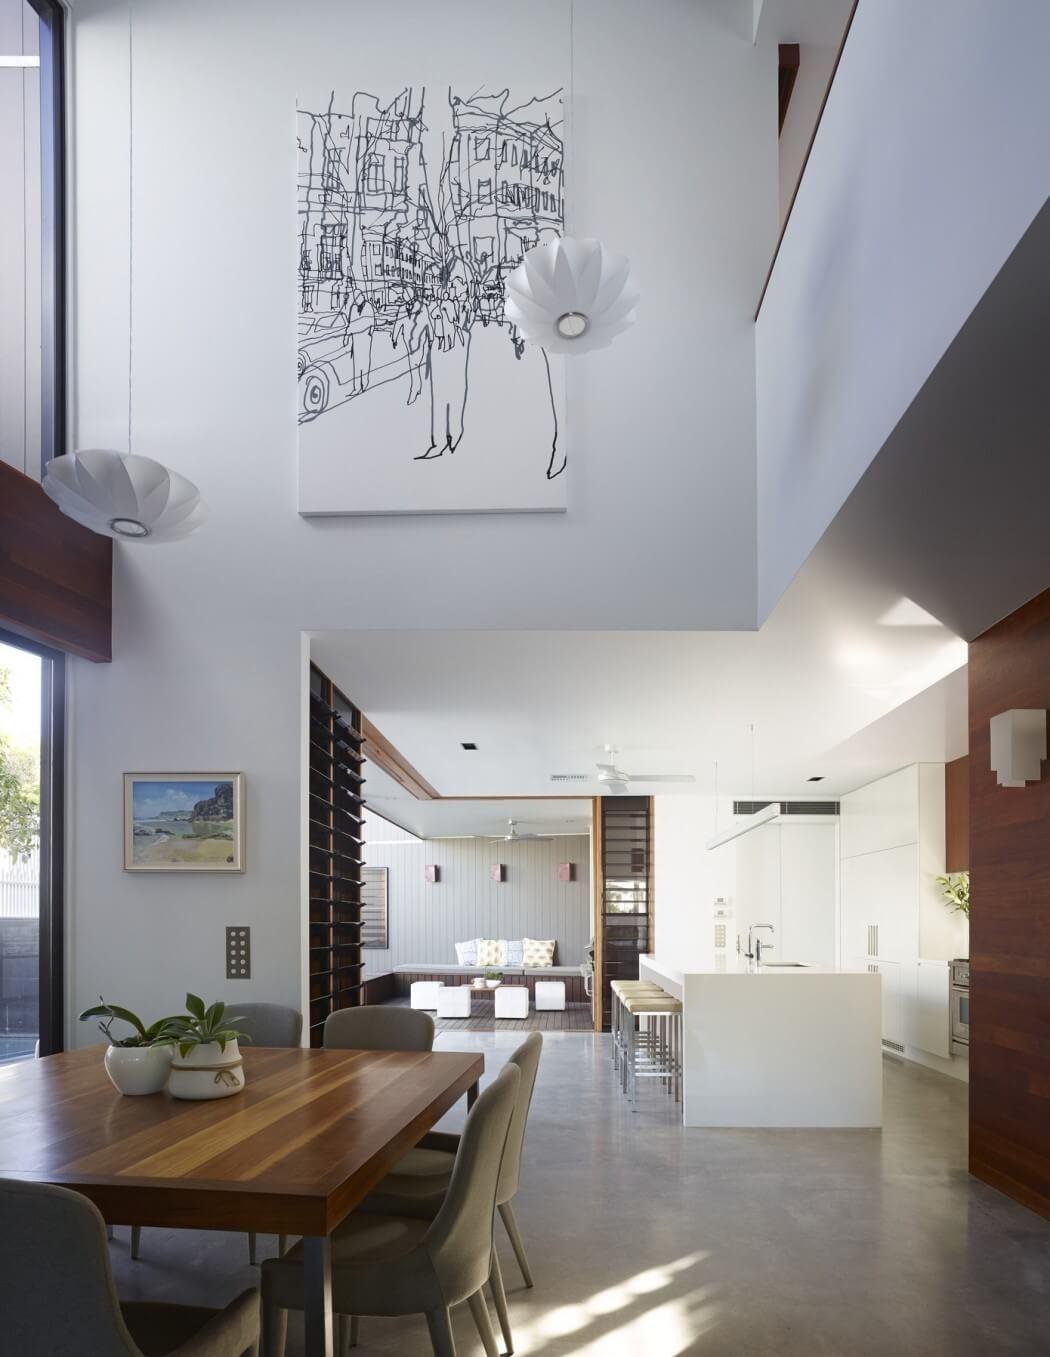 Beach House by Shaun Lockyer Architects | Interior | Pinterest ...